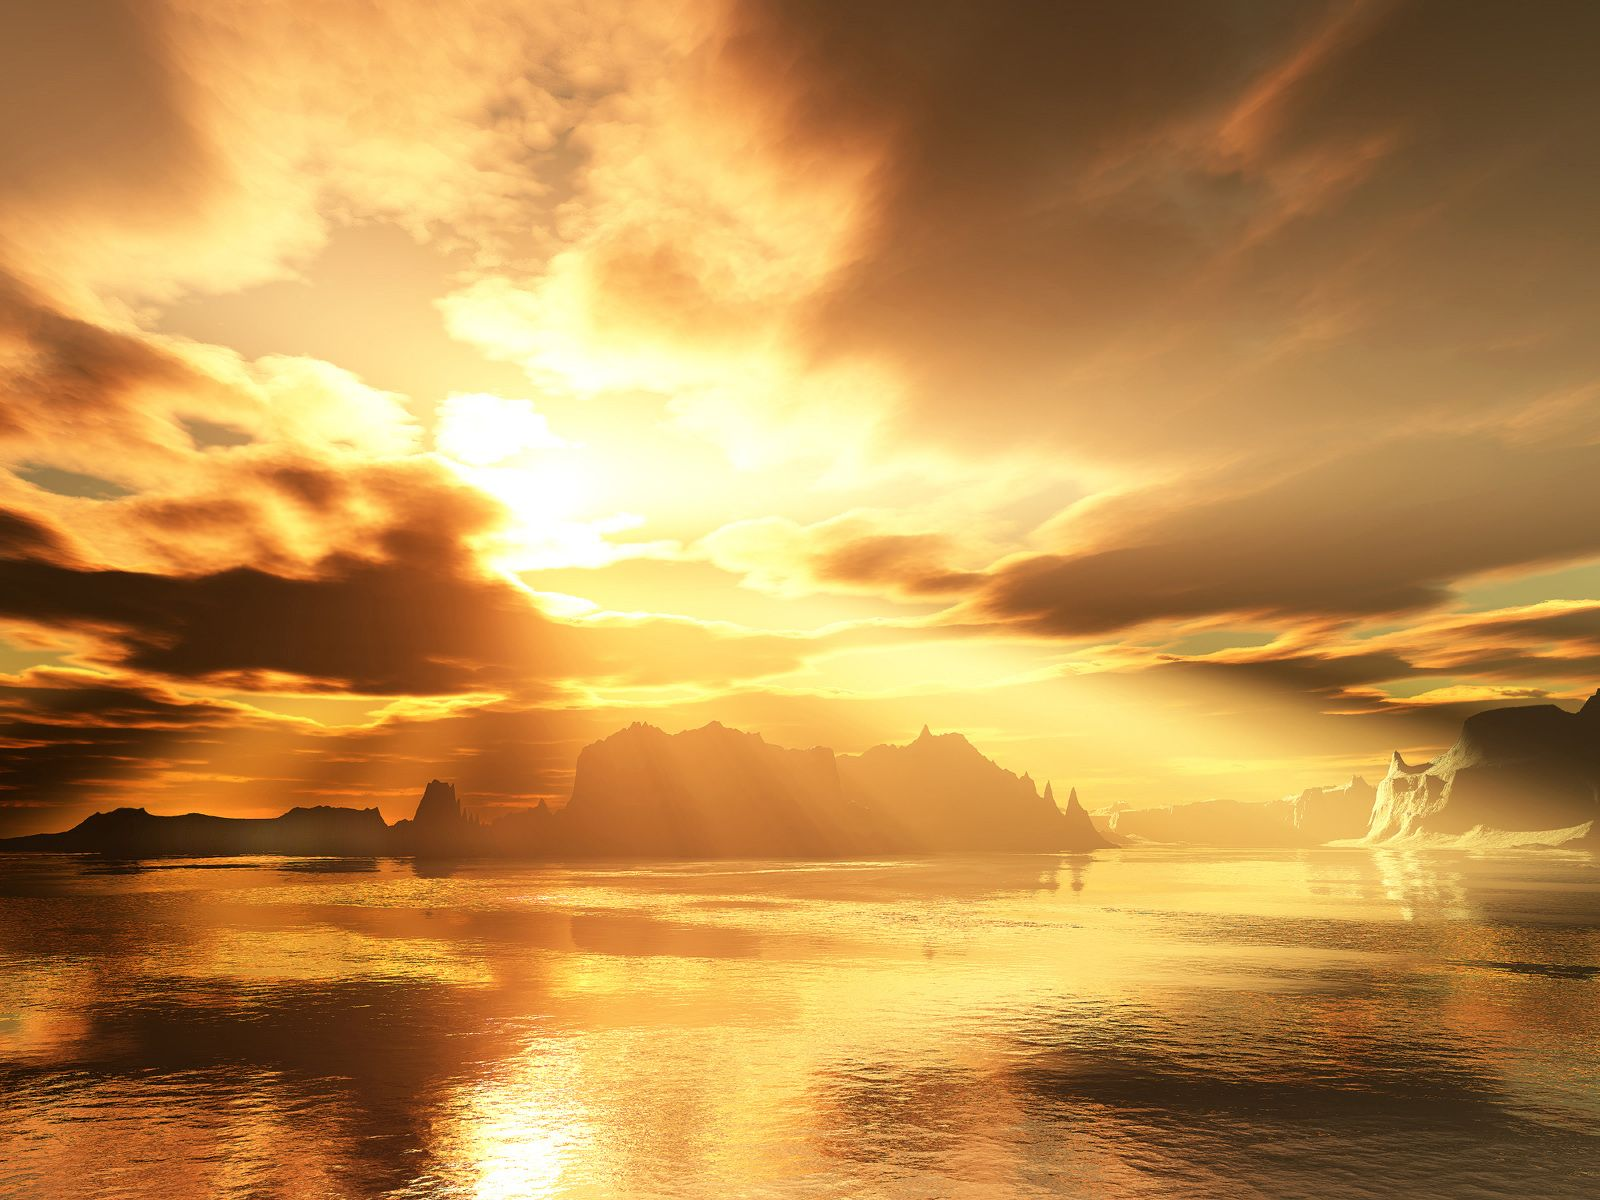 Gold Sky Wallpapers Top Free Gold Sky Backgrounds Wallpaperaccess Wallpaper hills sunset sky sea golden